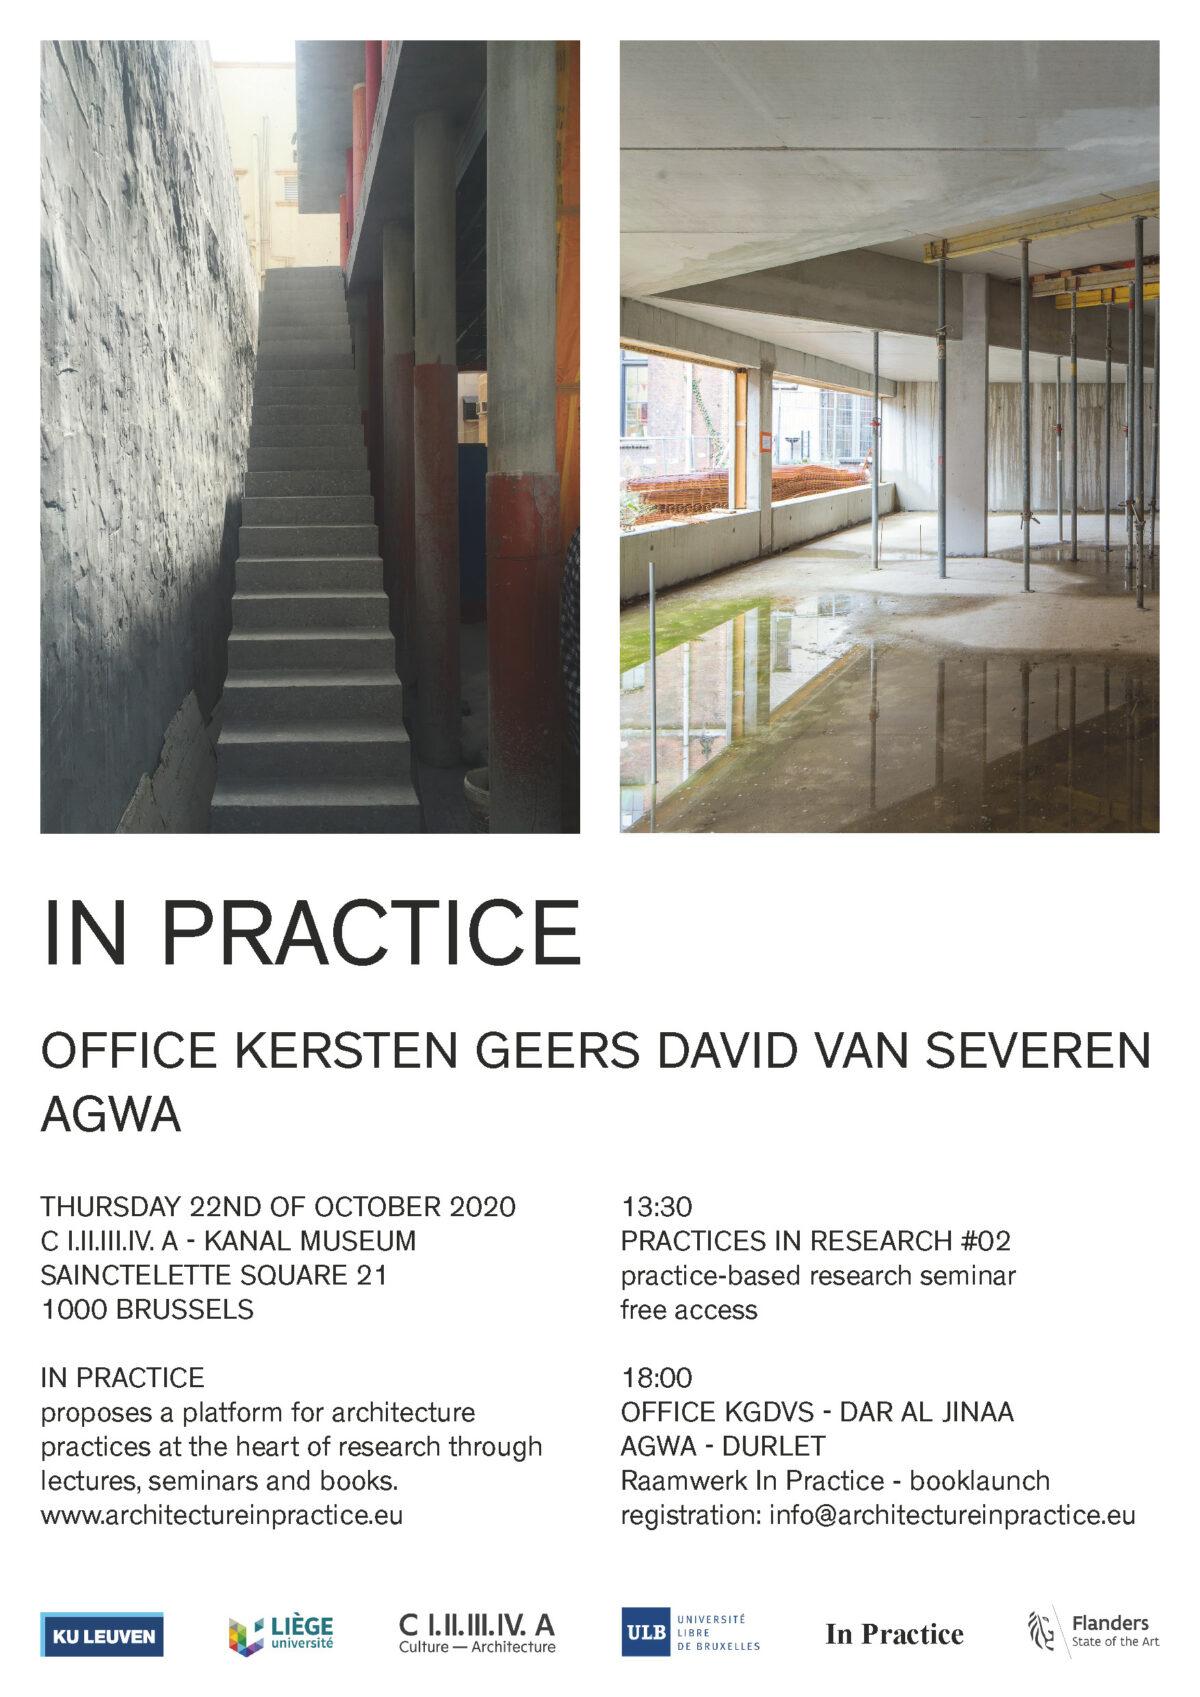 inpractice_officekgdvs_agwa_200822